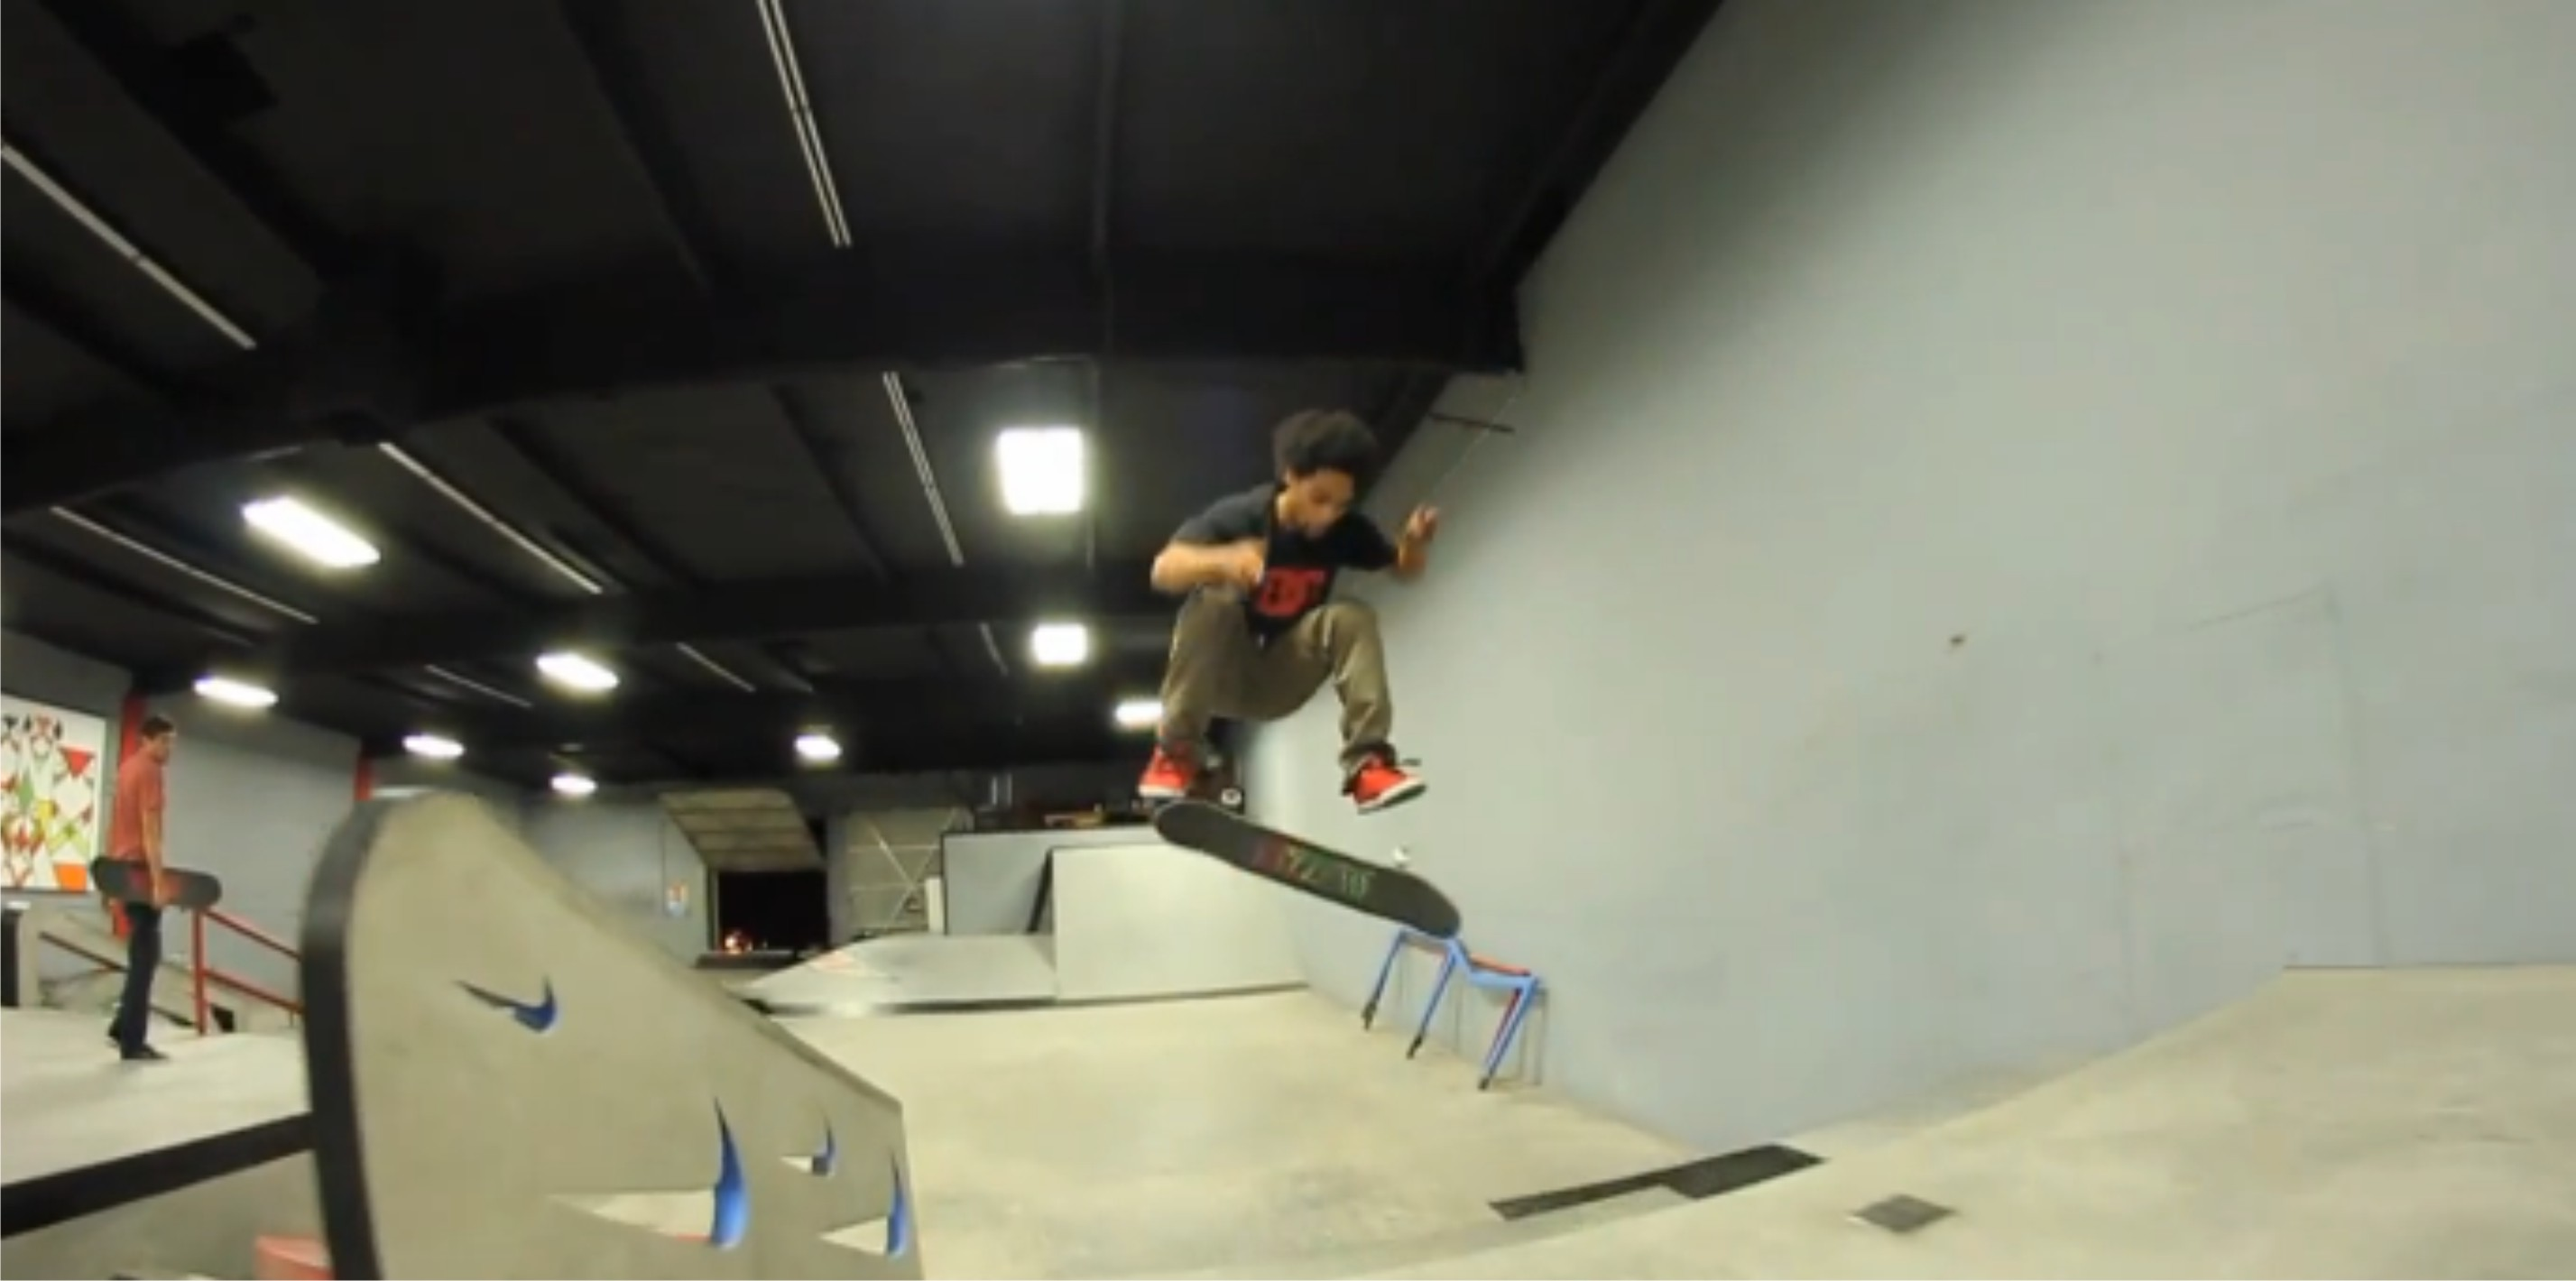 Moses Adams latest skateboarding video - Full Clip Friday